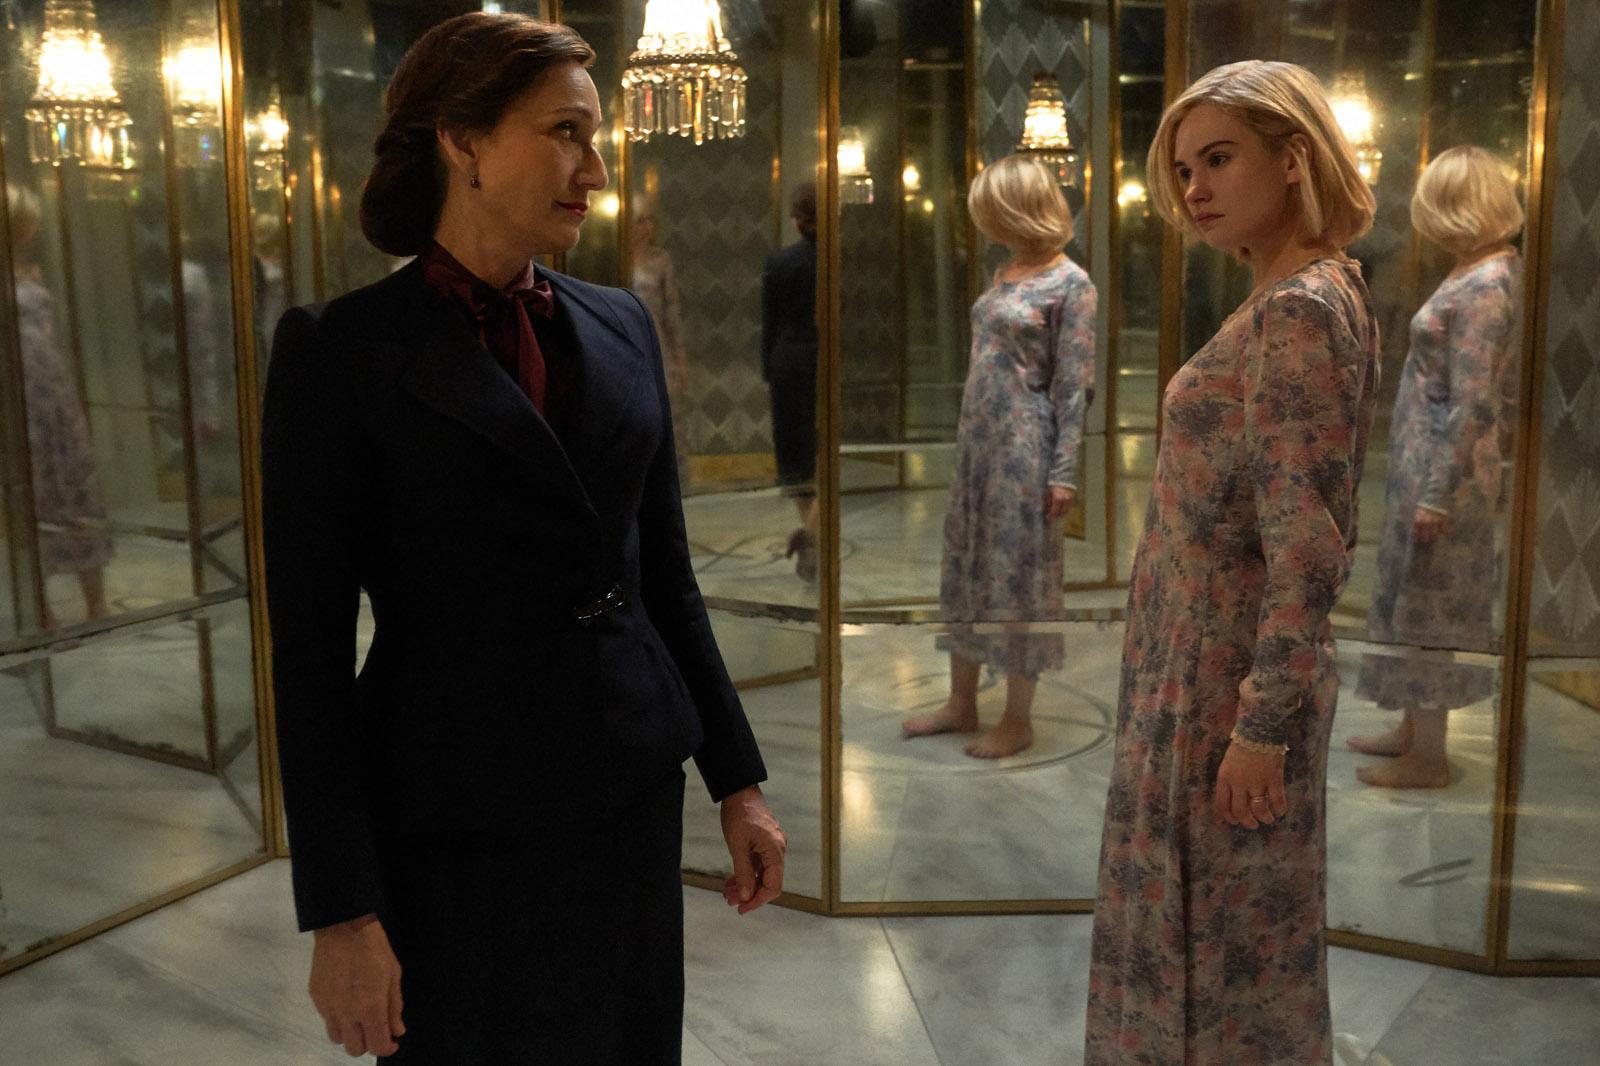 Rebecca:(L to R) Kristin Scott Thomas as Mrs. Danvers, Lily James as Mrs. de Winter. Cr. KERRY BROWN/NETFLIX